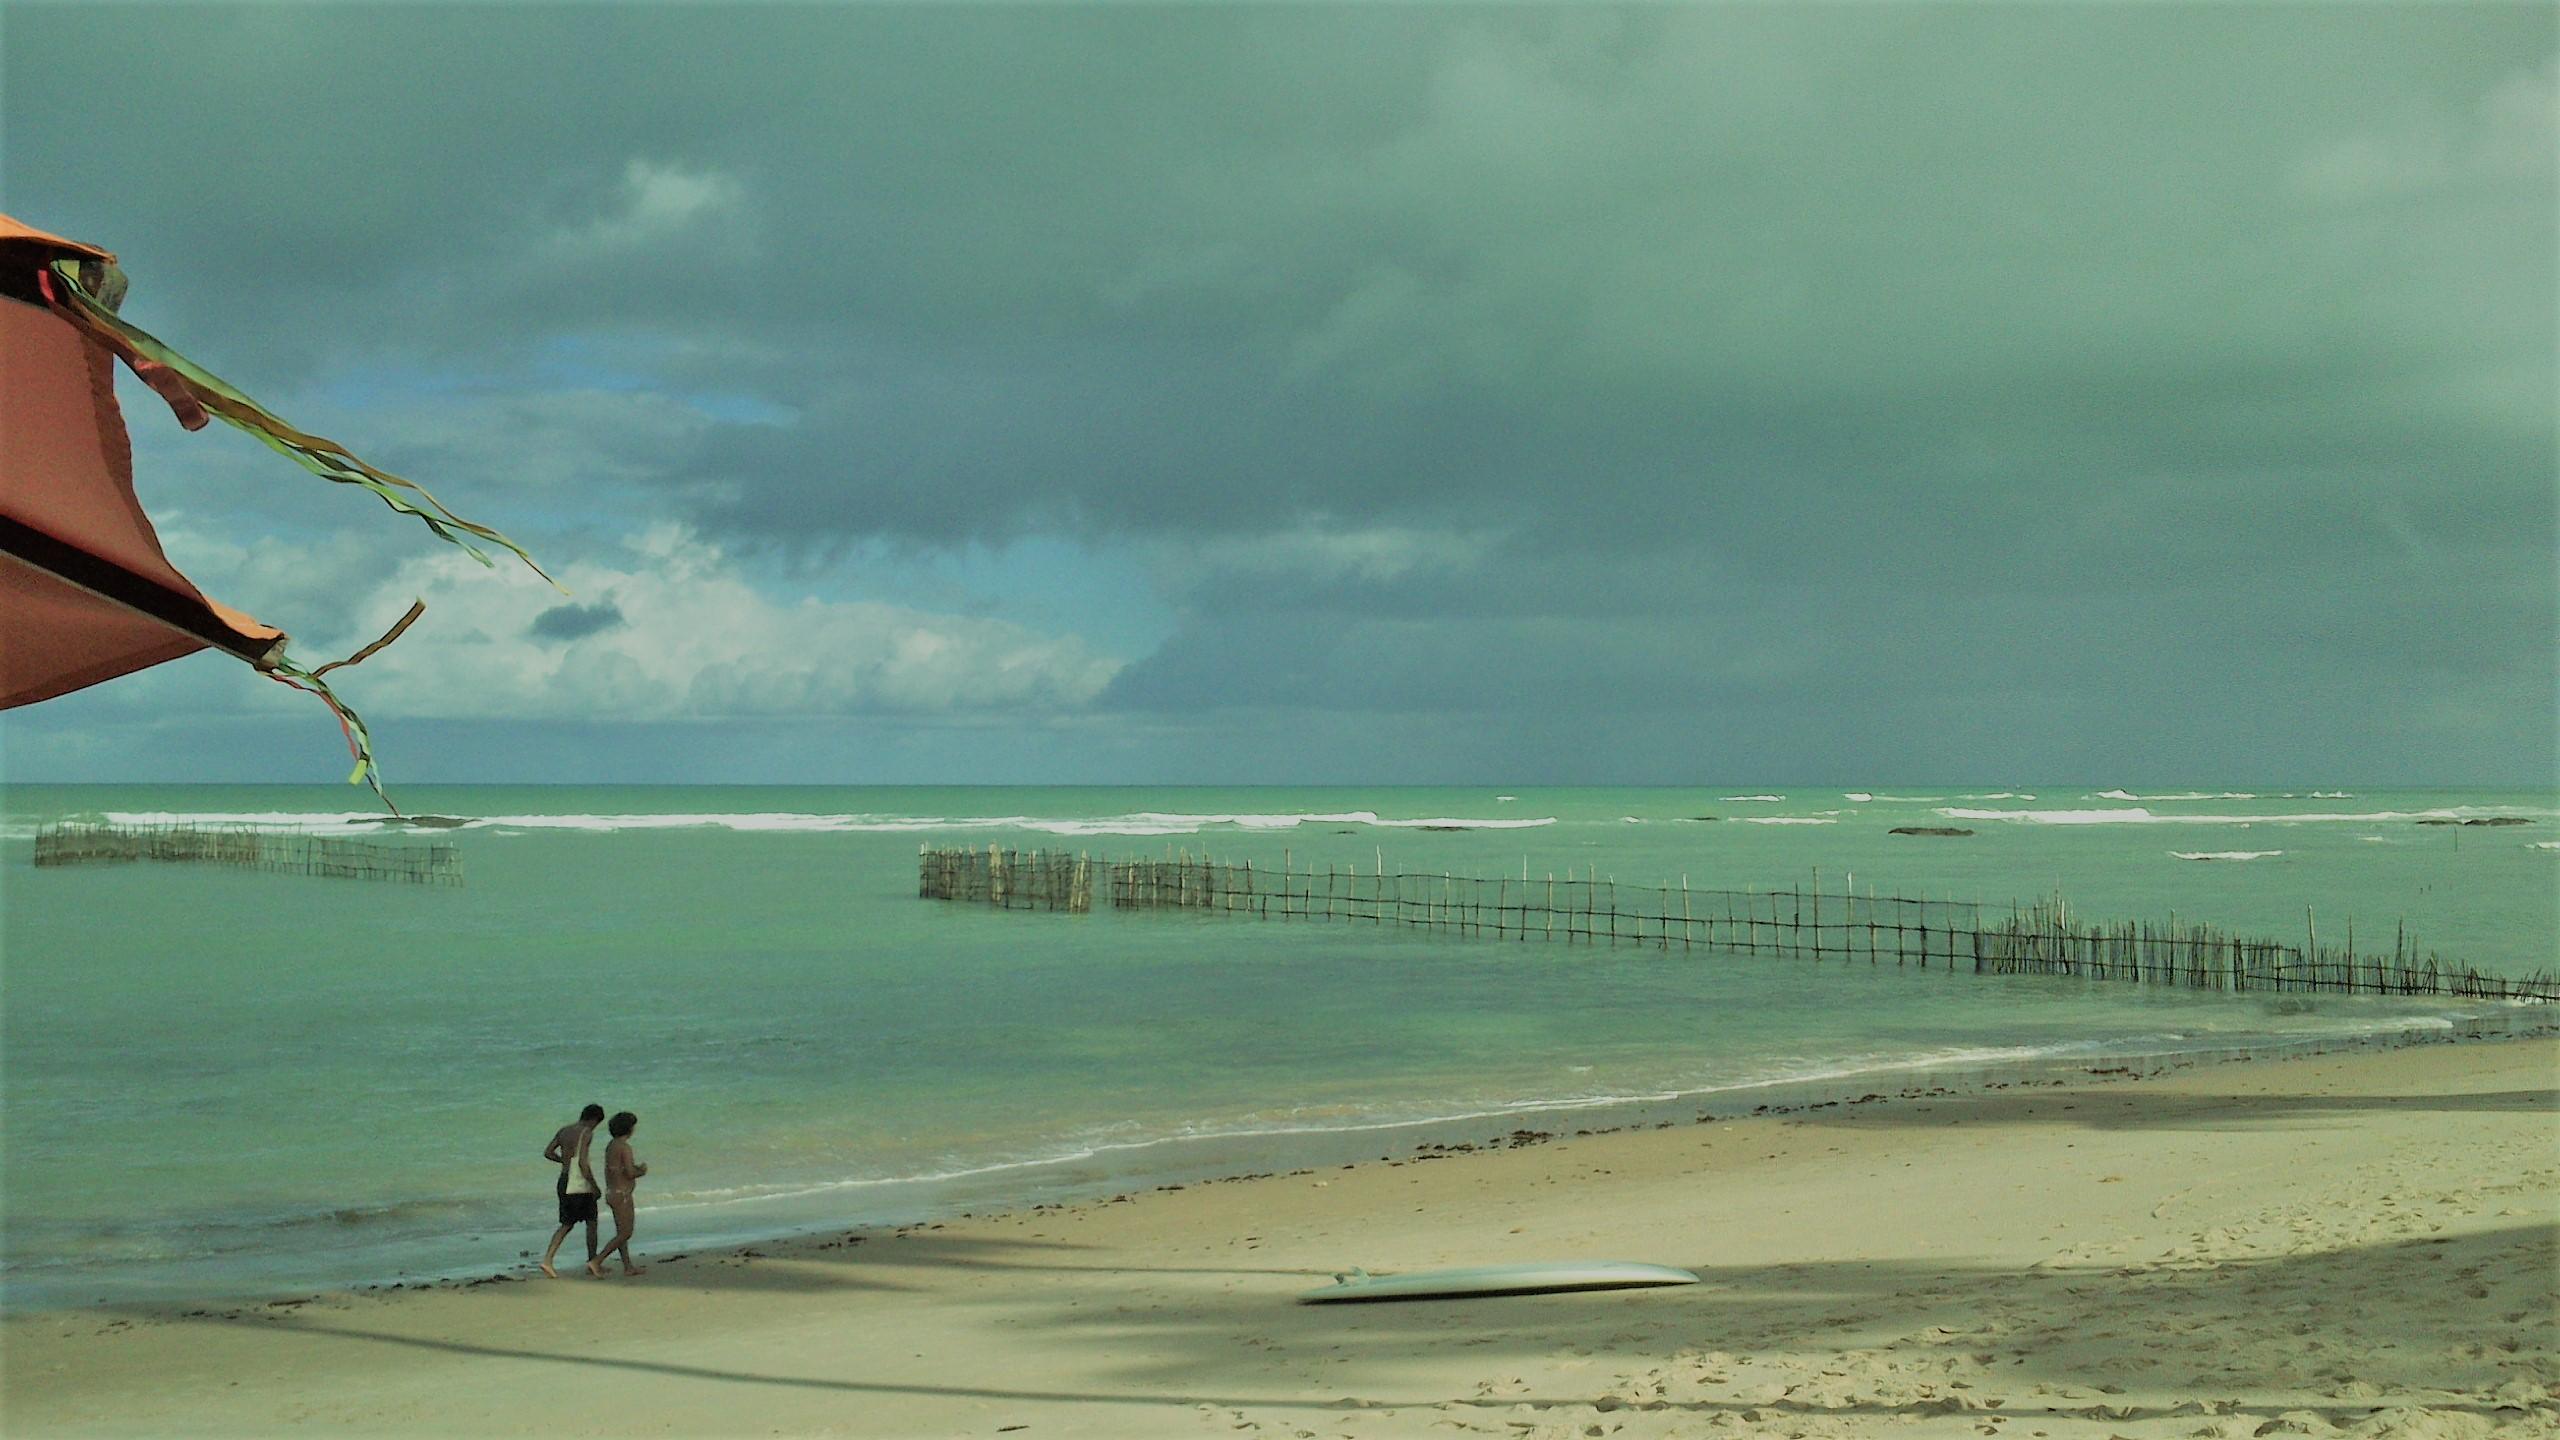 GoBrazil Beach